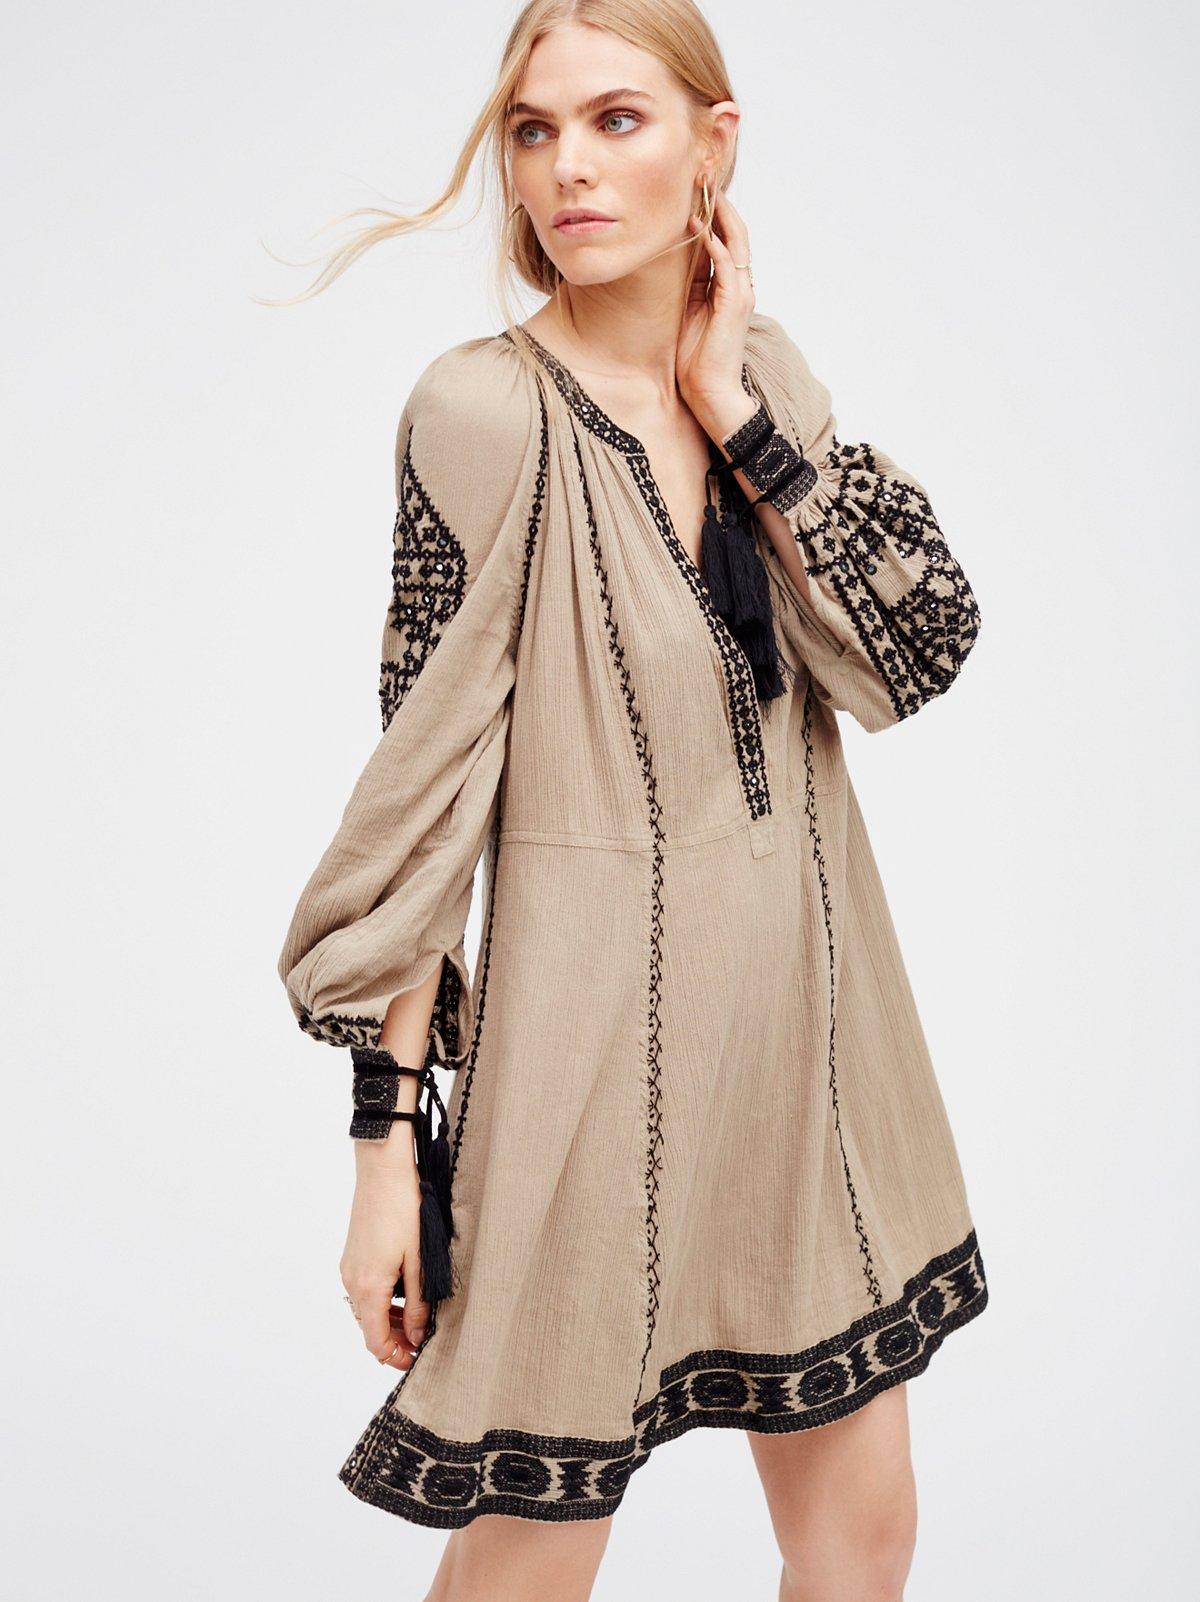 new romantics new romantics magnolia dress at free people clothing boutique. Black Bedroom Furniture Sets. Home Design Ideas